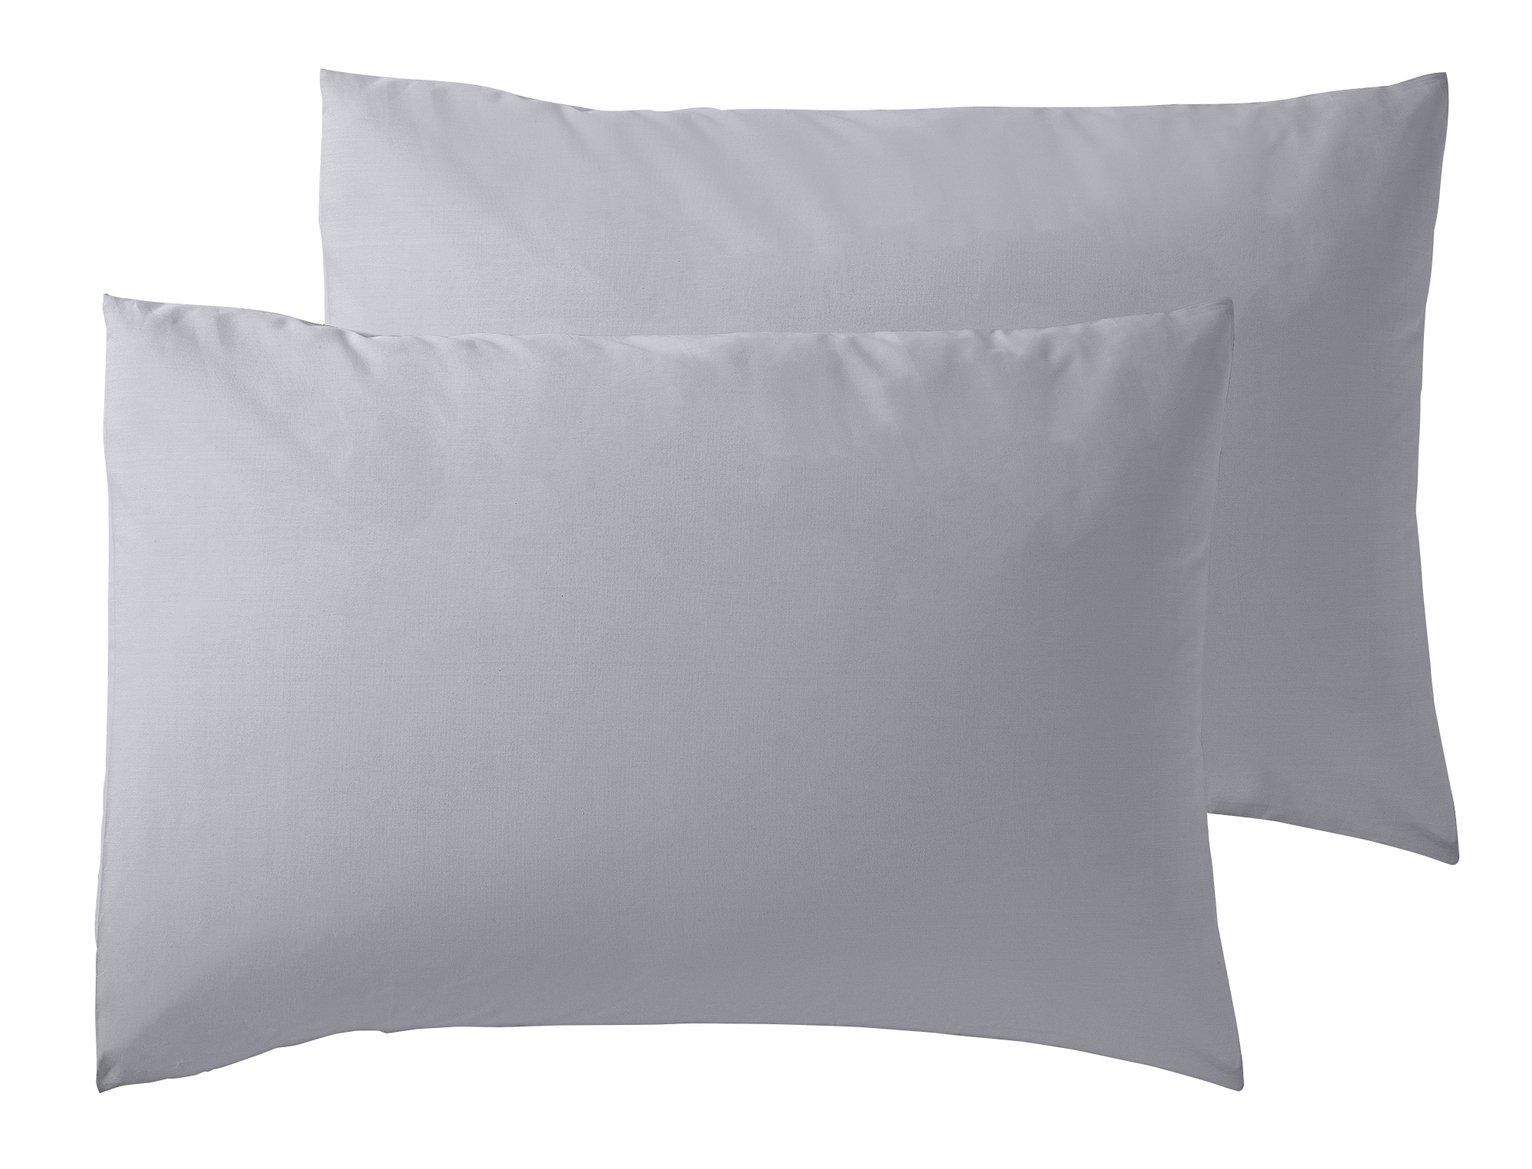 Argos Home Cool Cotton Standard Pillowcase Pair